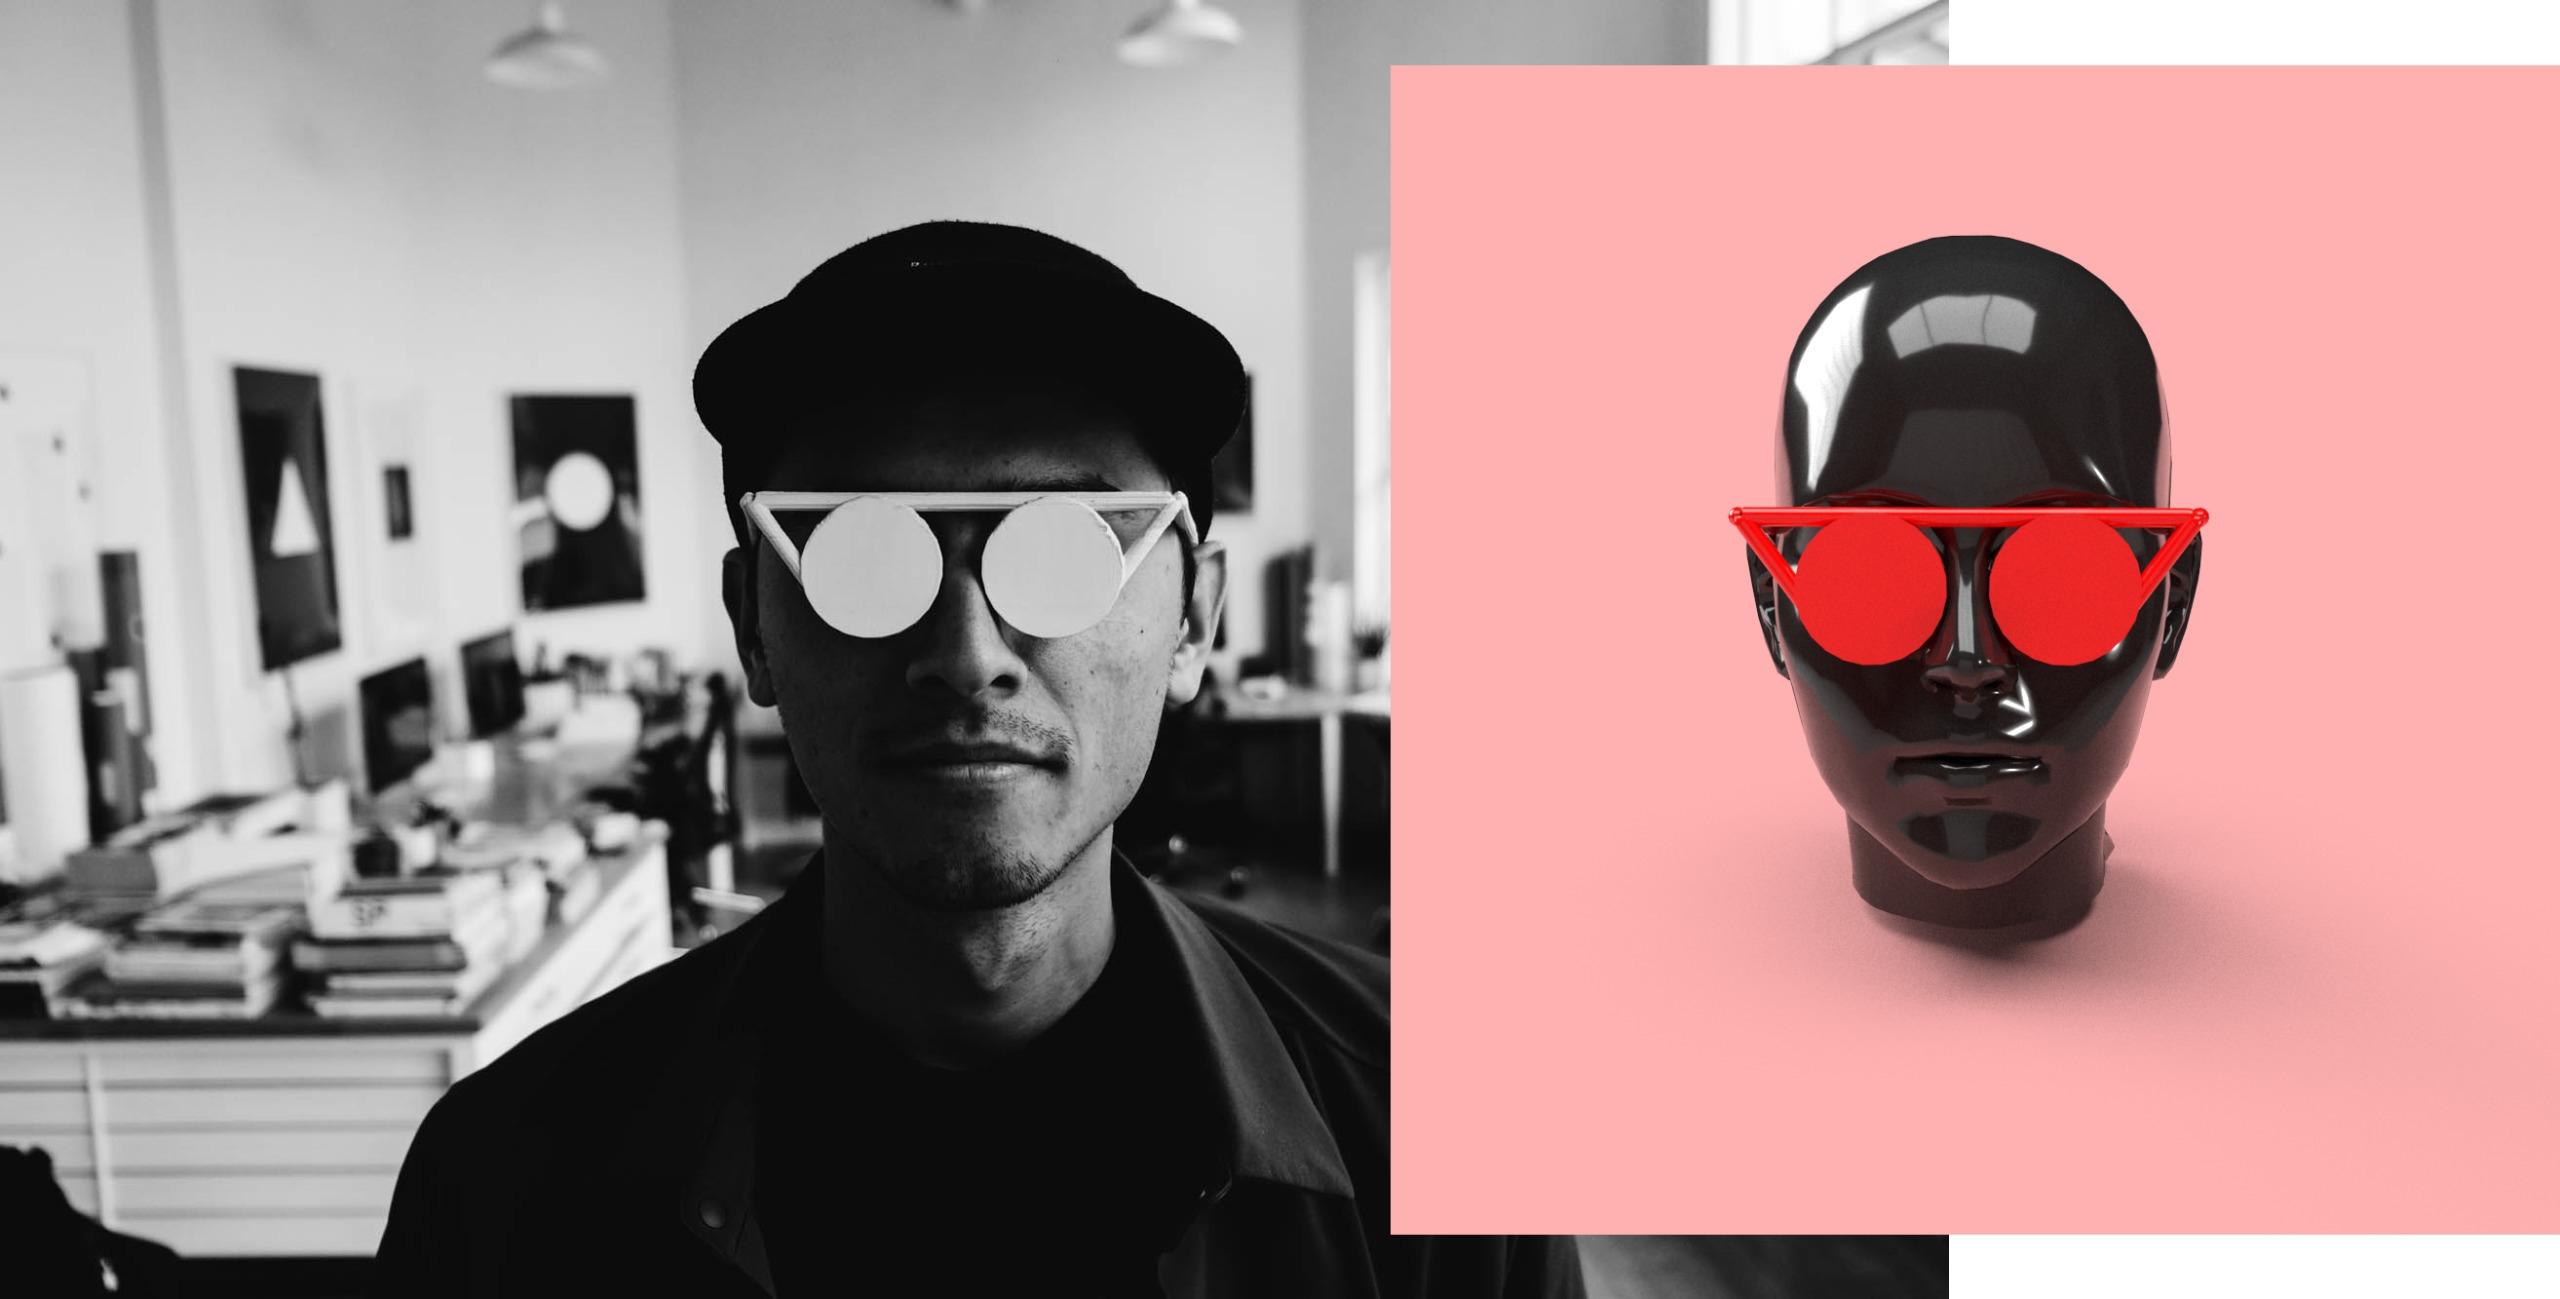 3D printed VR designed HMD (Hea - lucian | ello